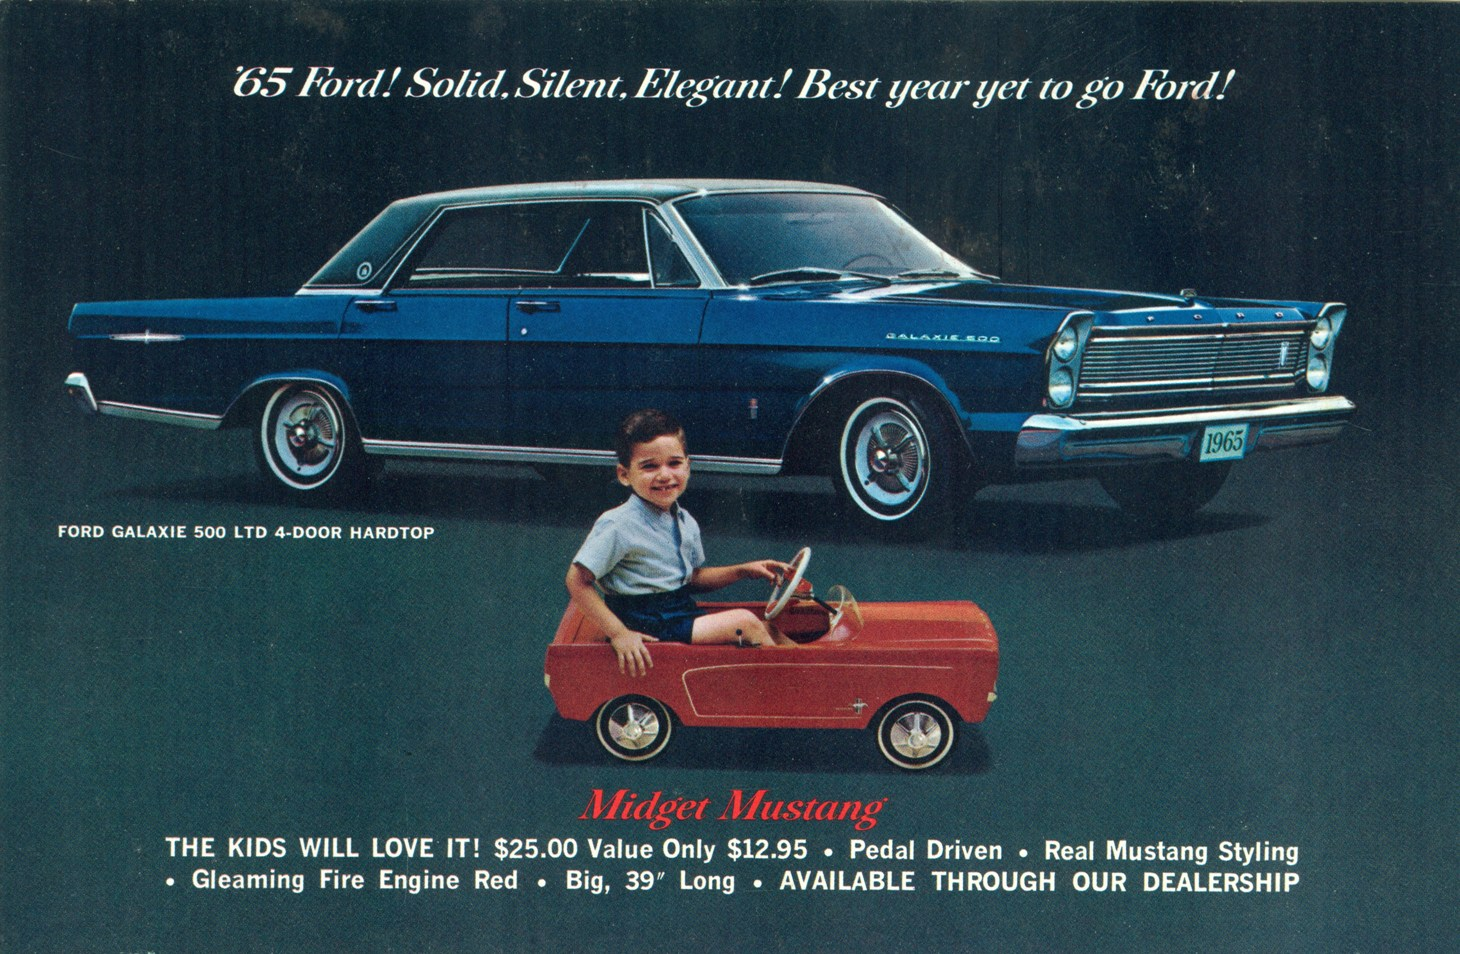 1965-Ford-Galaxie-500-LTD-Hardtop-Midget-Mustang